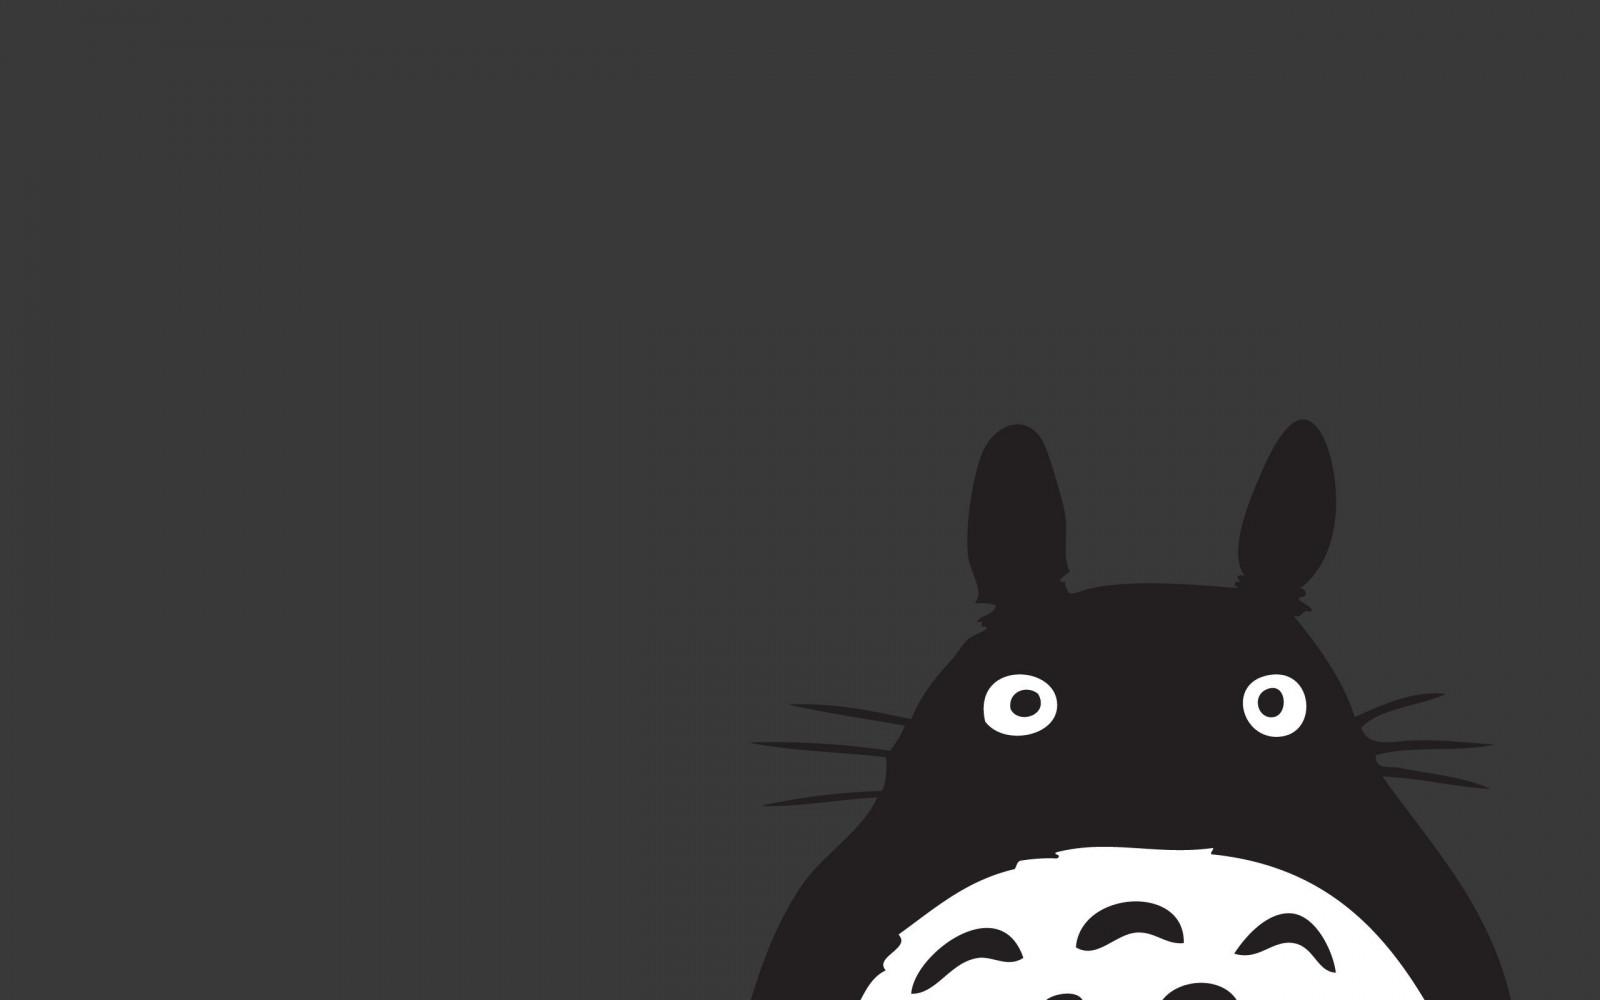 56+ Gambar Kartun Binatang Kelinci HD Terbaik